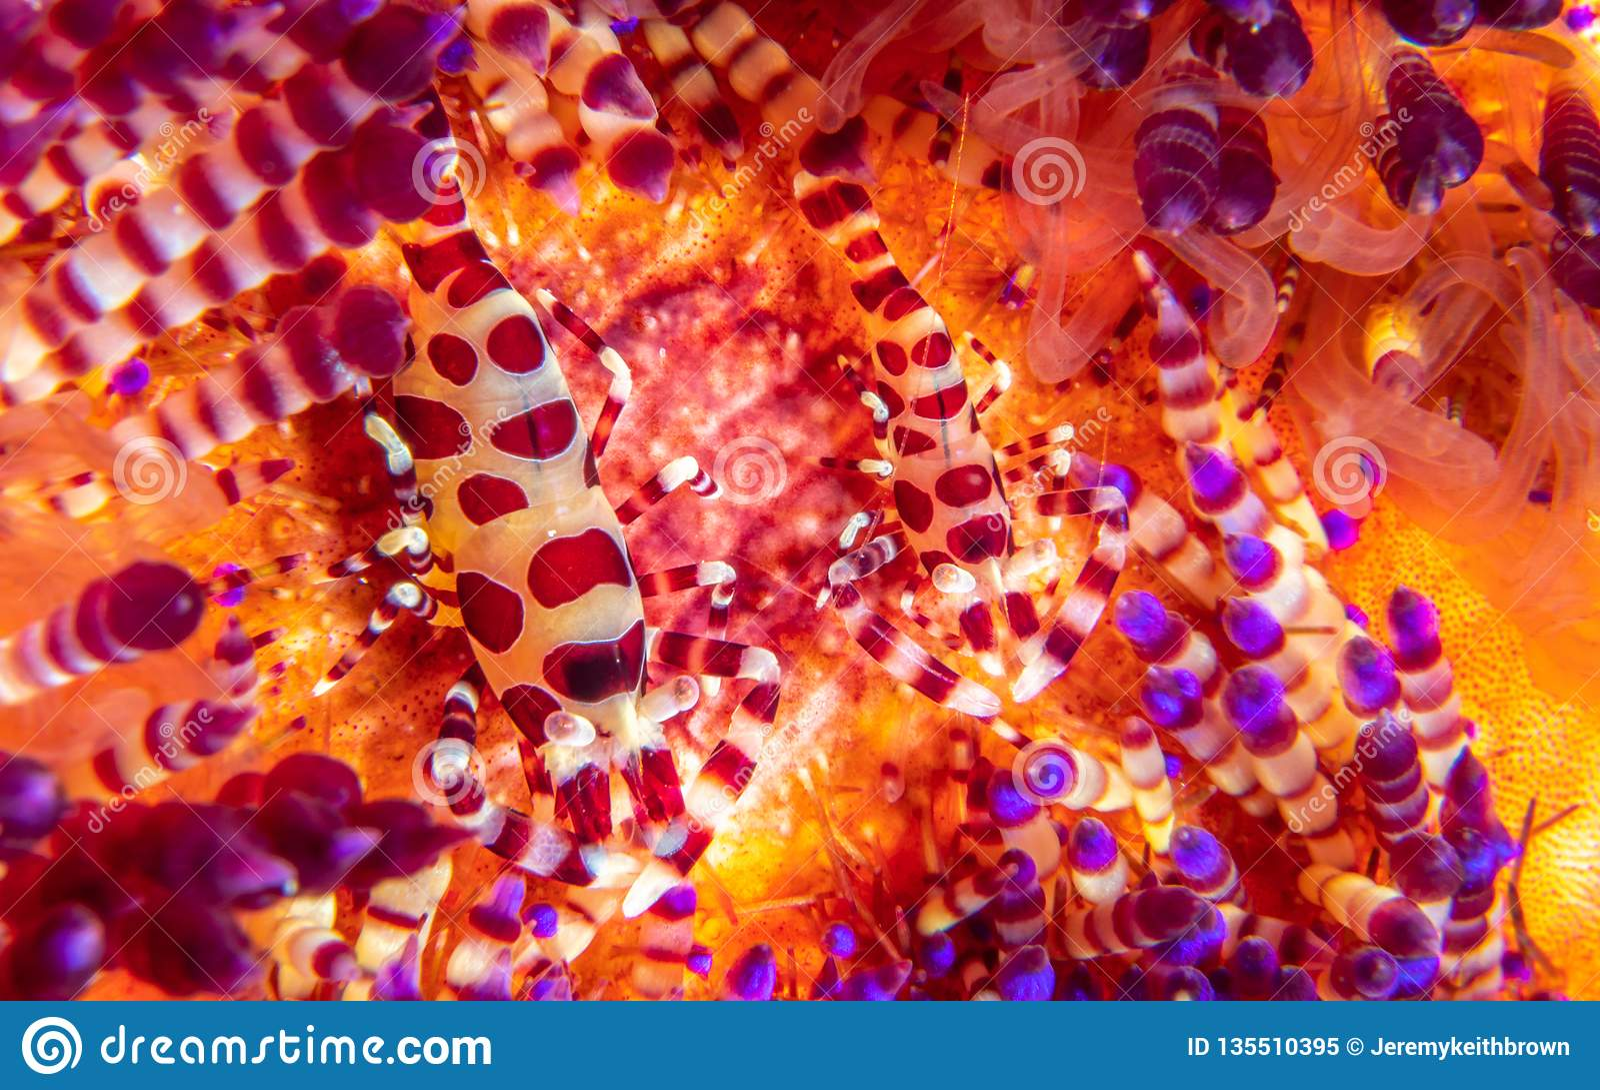 Coleman shrimp, Periclimenes colemani, on fire urchin, Astropyga radiata